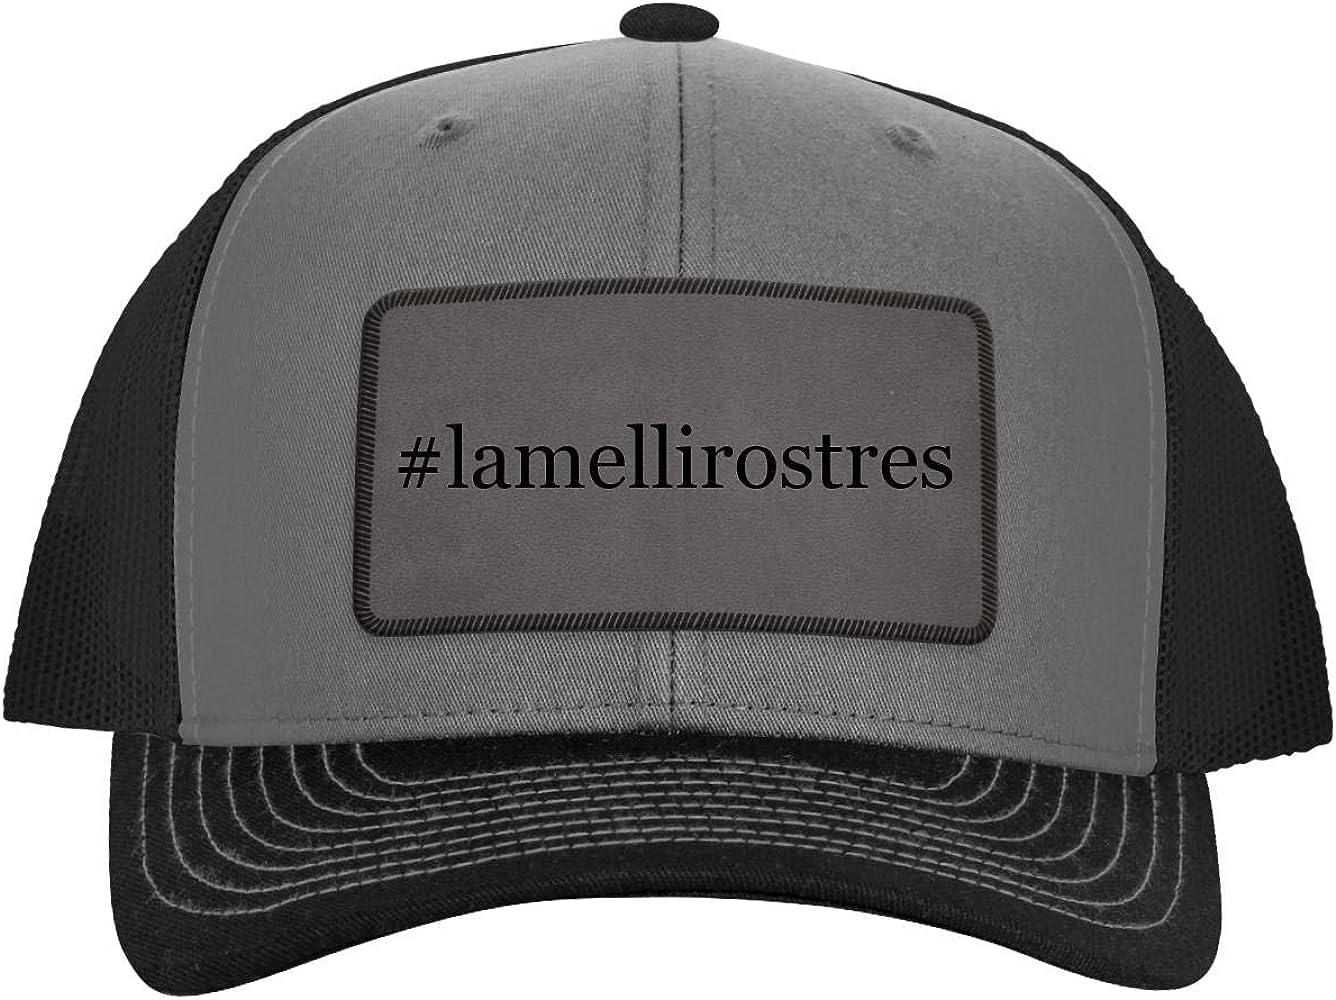 Hashtag Leather Dark Brown Patch Engraved Trucker Hat One Legging it Around #Griner